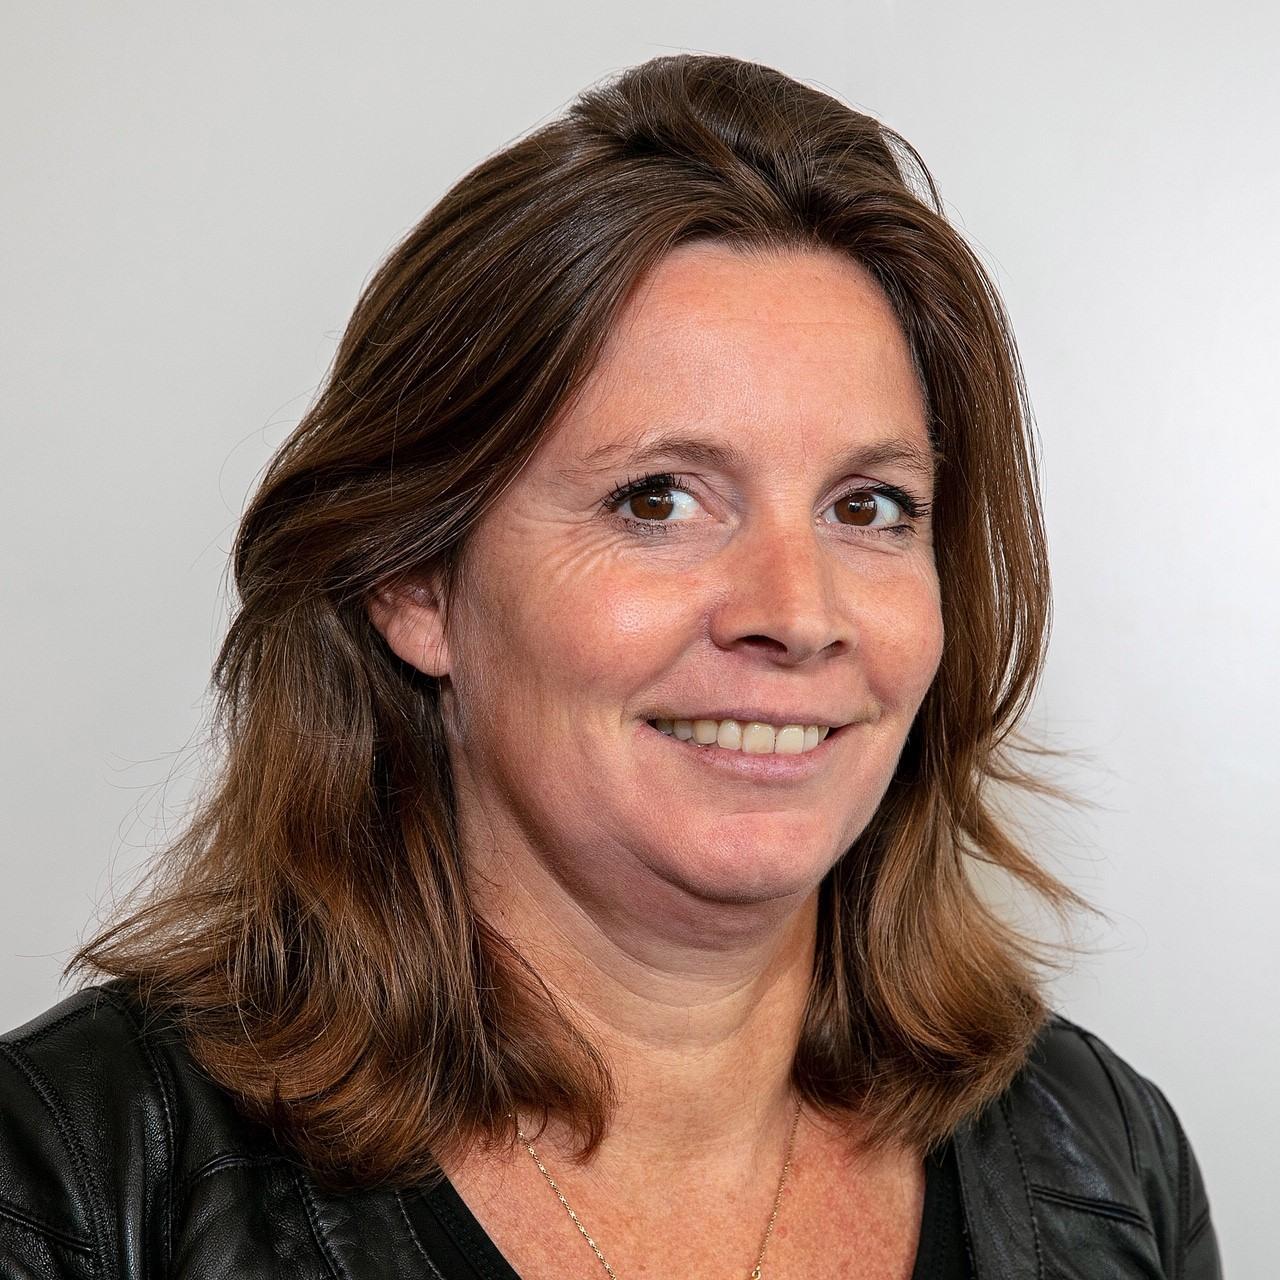 Sandra Duivenvoorde